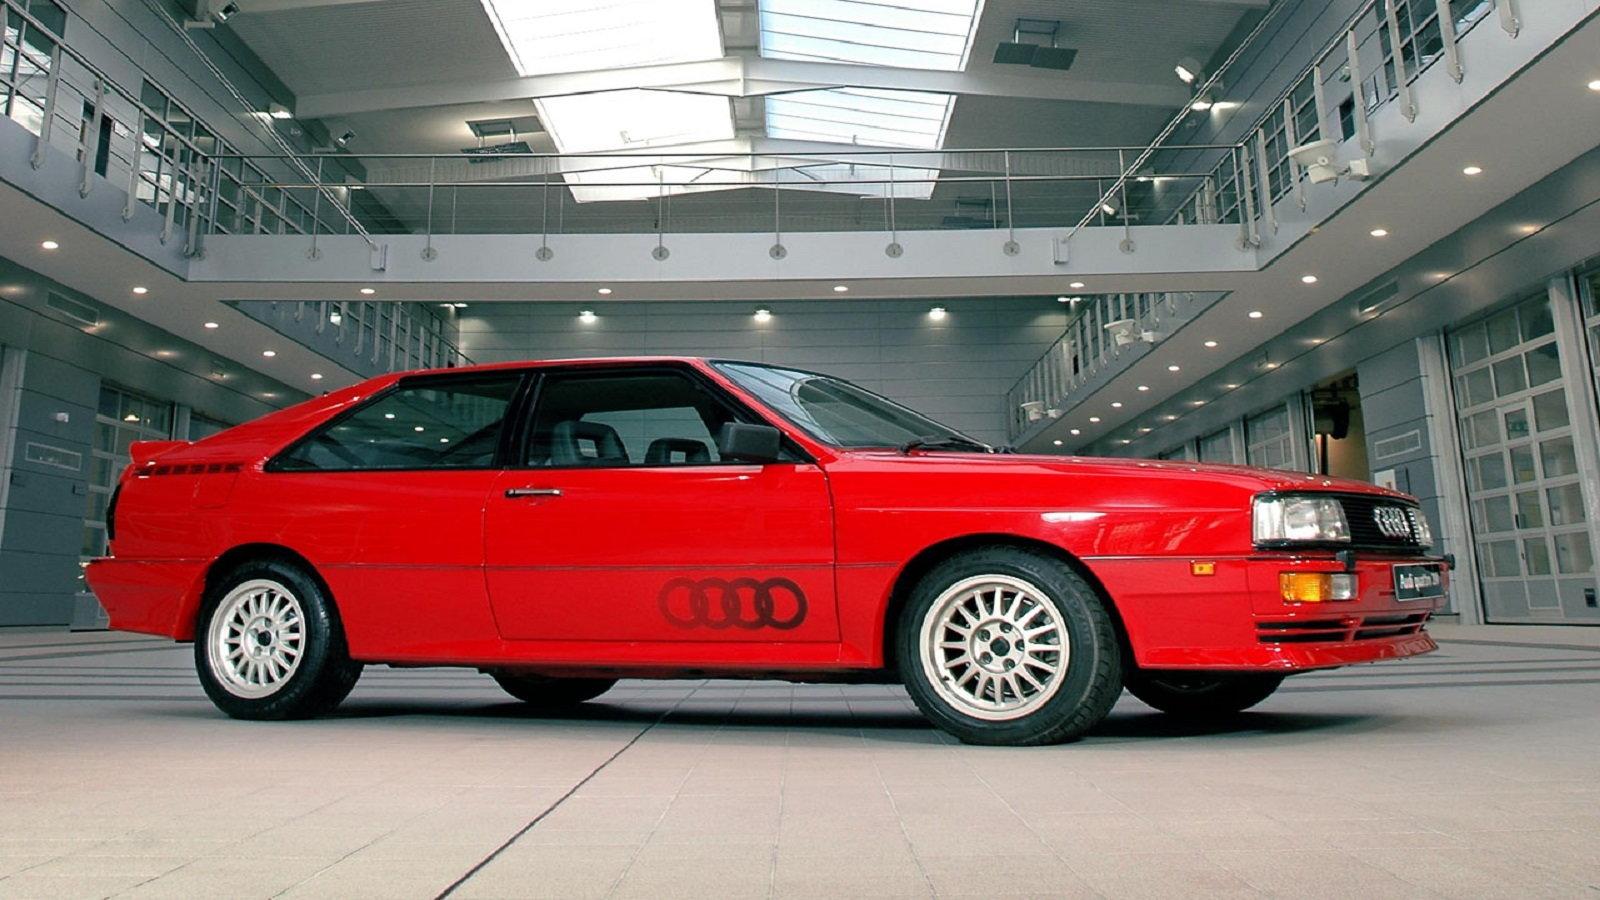 Kelebihan Kekurangan Audi Ur Quattro Murah Berkualitas